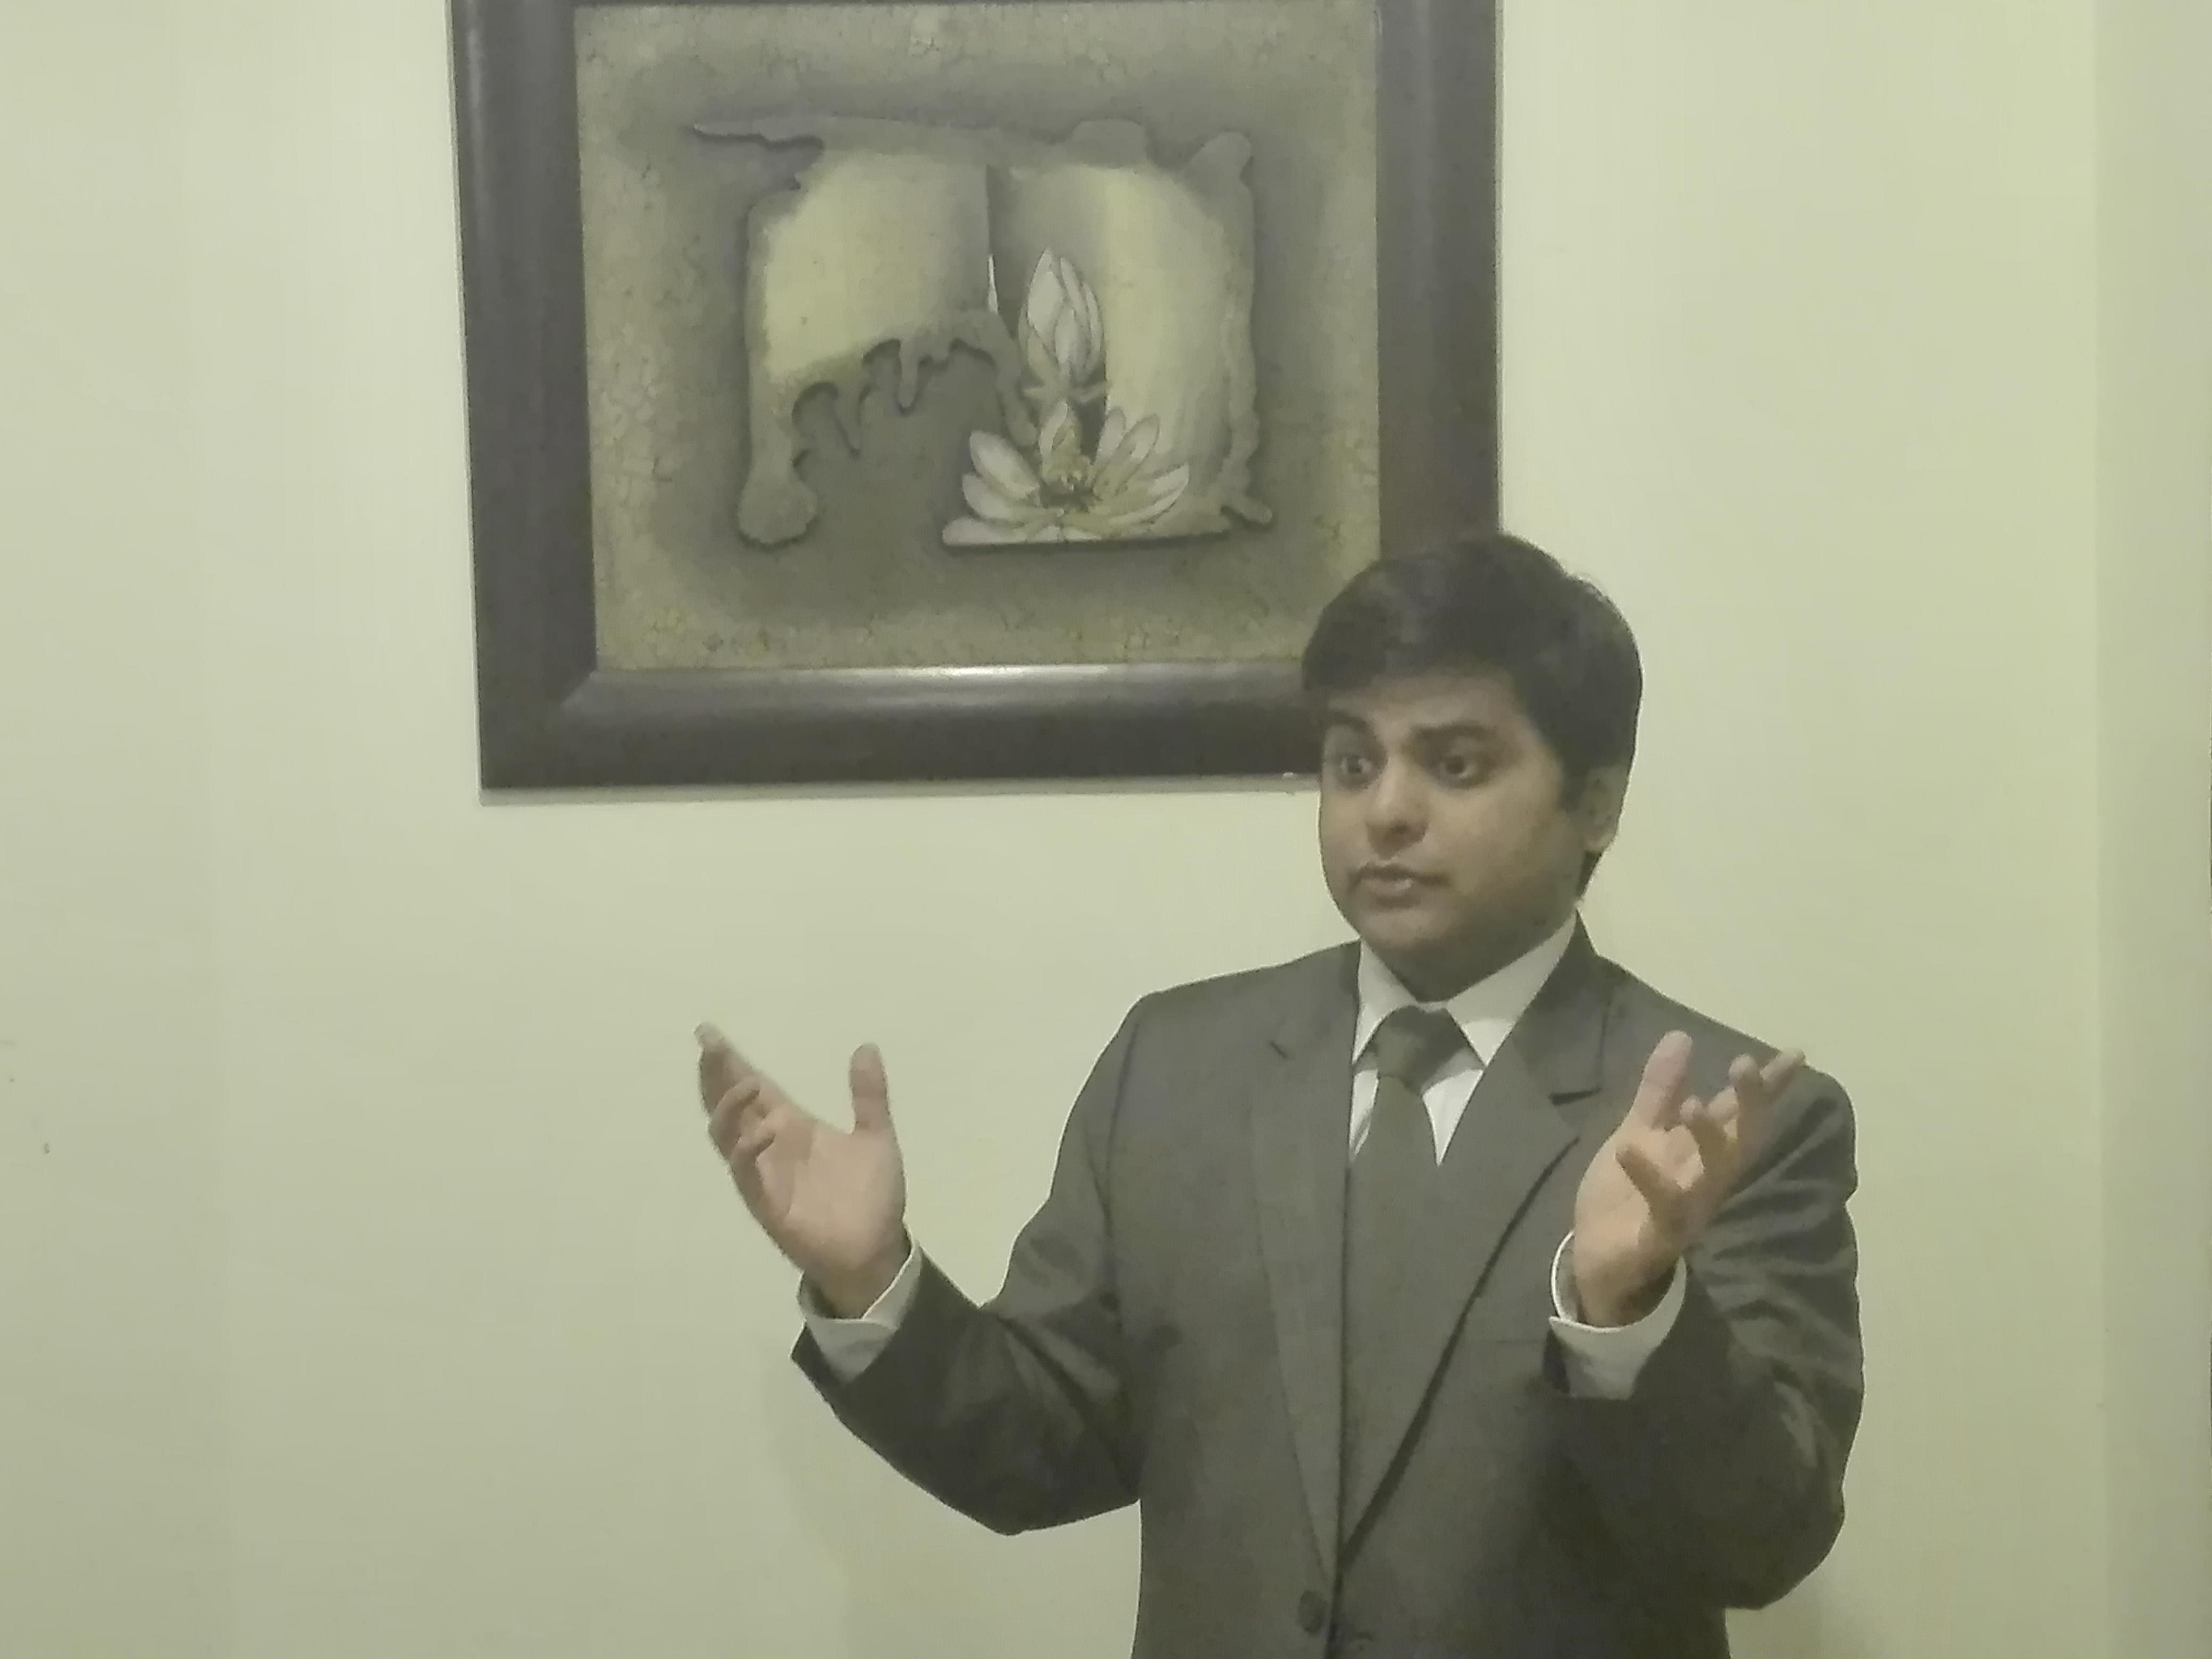 Safvan Malik